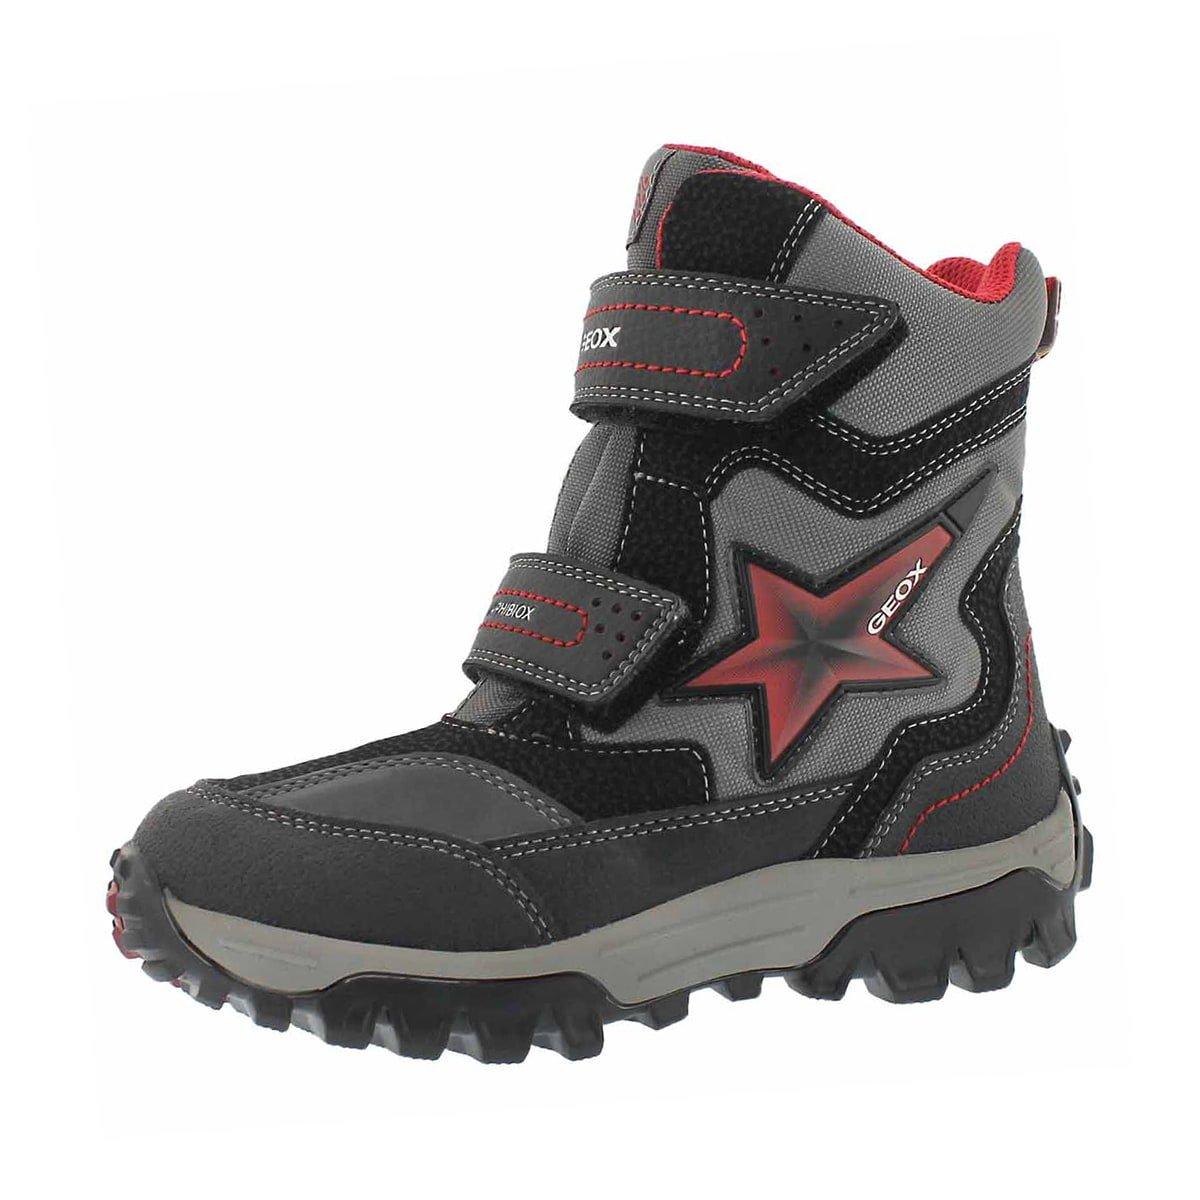 Geox Boy's Himalaya ABX B Winter Boot Blk/Red 30 M EU by Geox